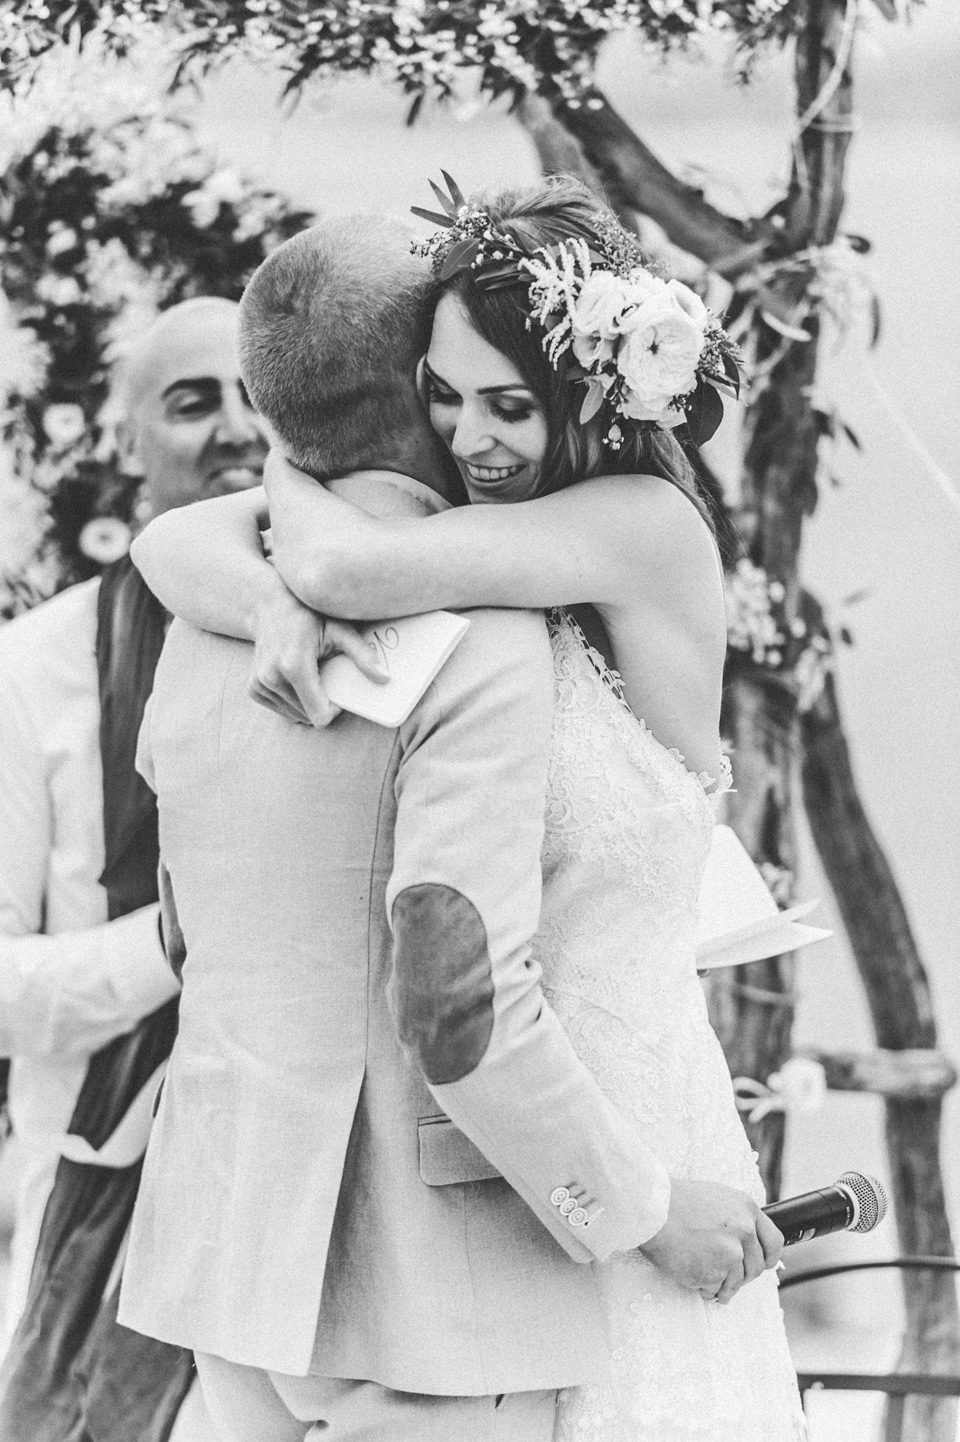 bohemian-ibiza-kreativ-wedding_0080 hochzeitsfotograf hochzeitsvideo ibiza bohemian weddingSaskia & Pierre Bohemian Bohemian Ibiza Weddingbohemian ibiza kreativ wedding 0080